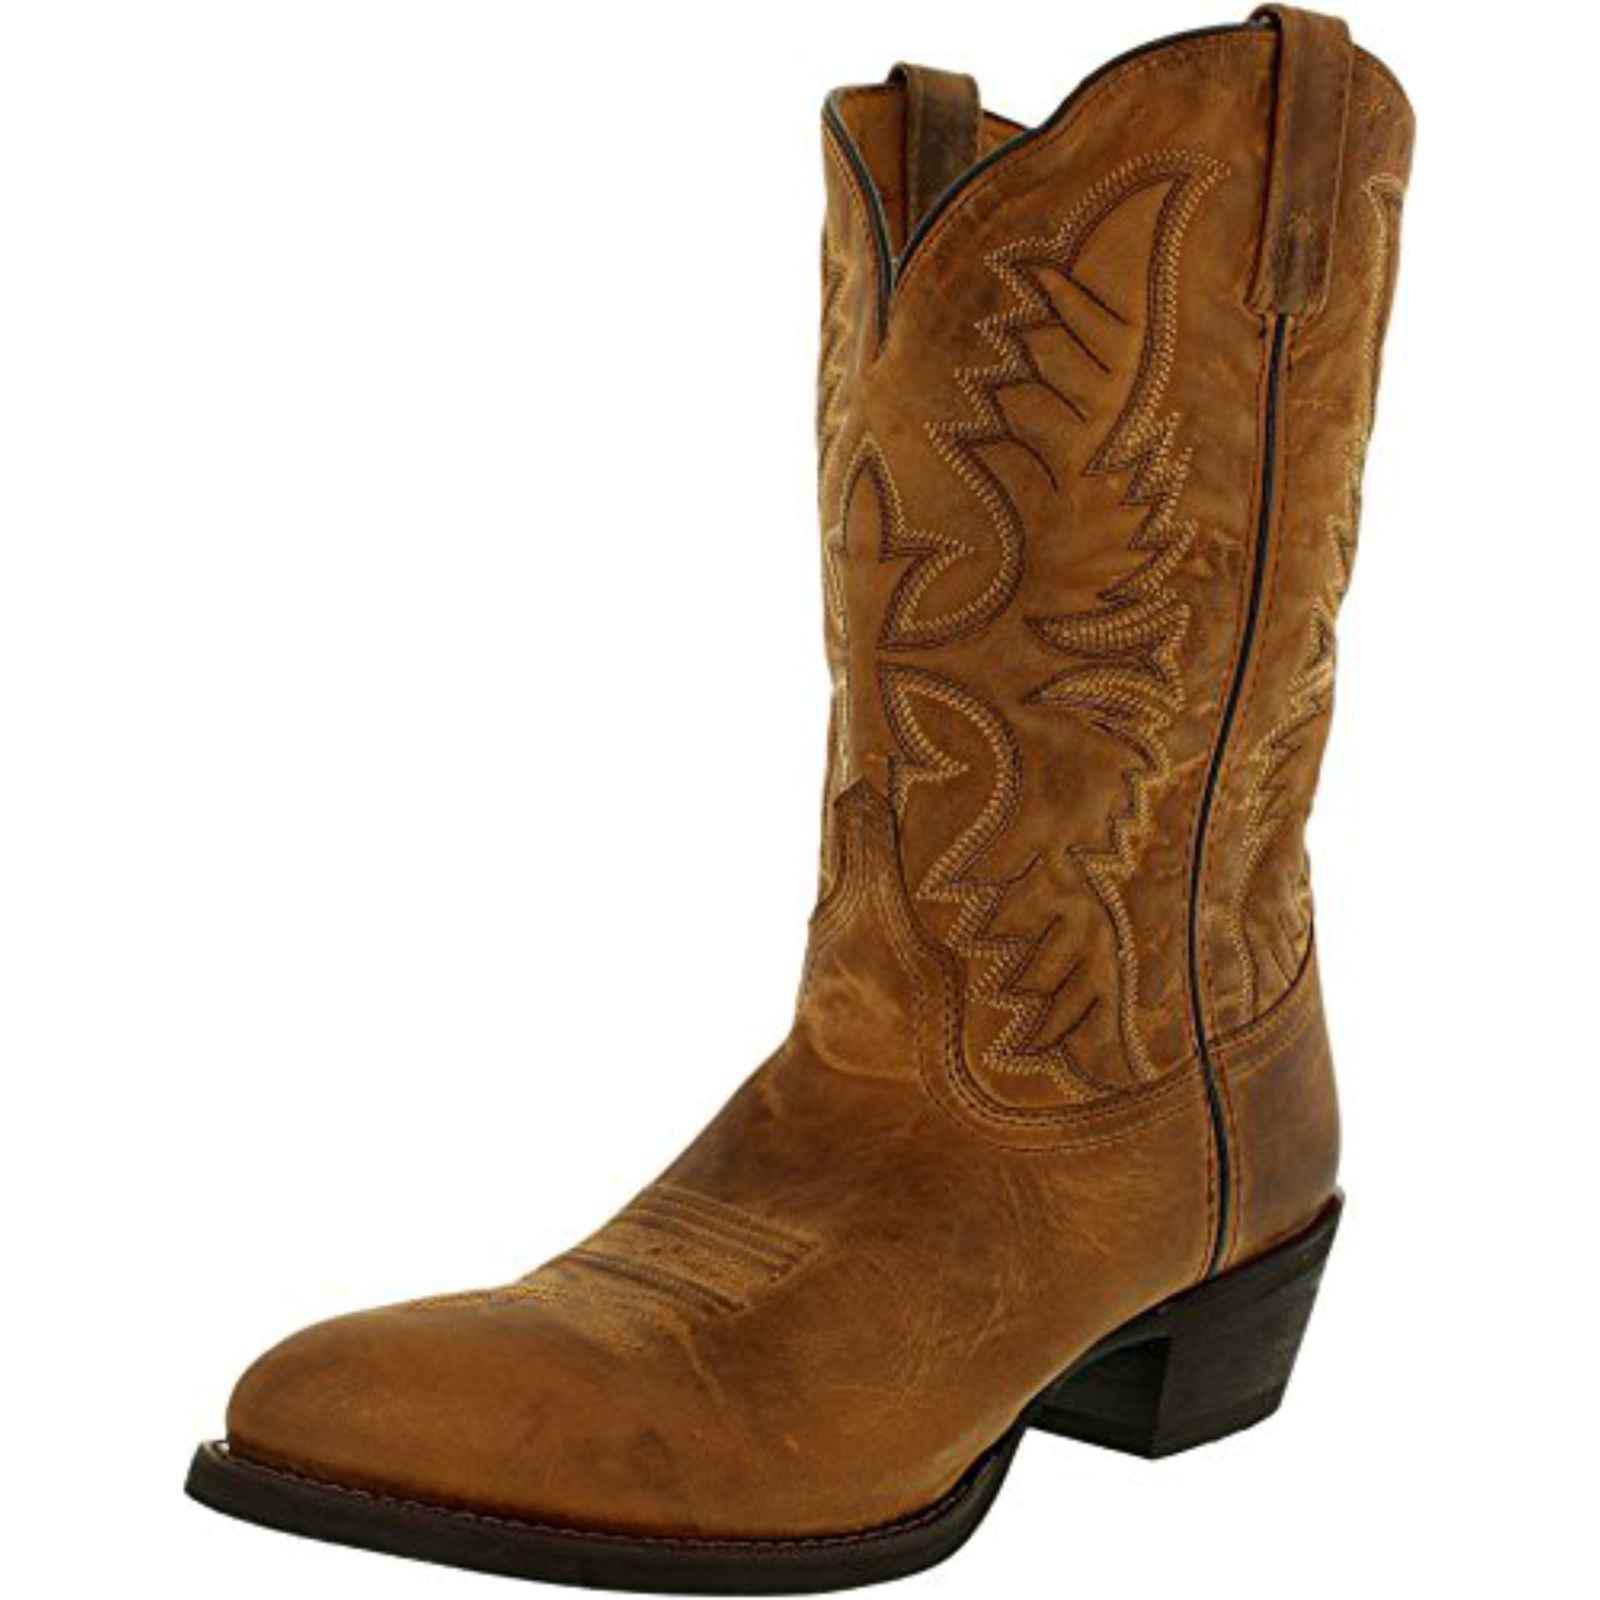 "Laredo Men's 12"" Birchwood Leather Cowboy Boot Tan Round Toe, 68452 by Laredo"